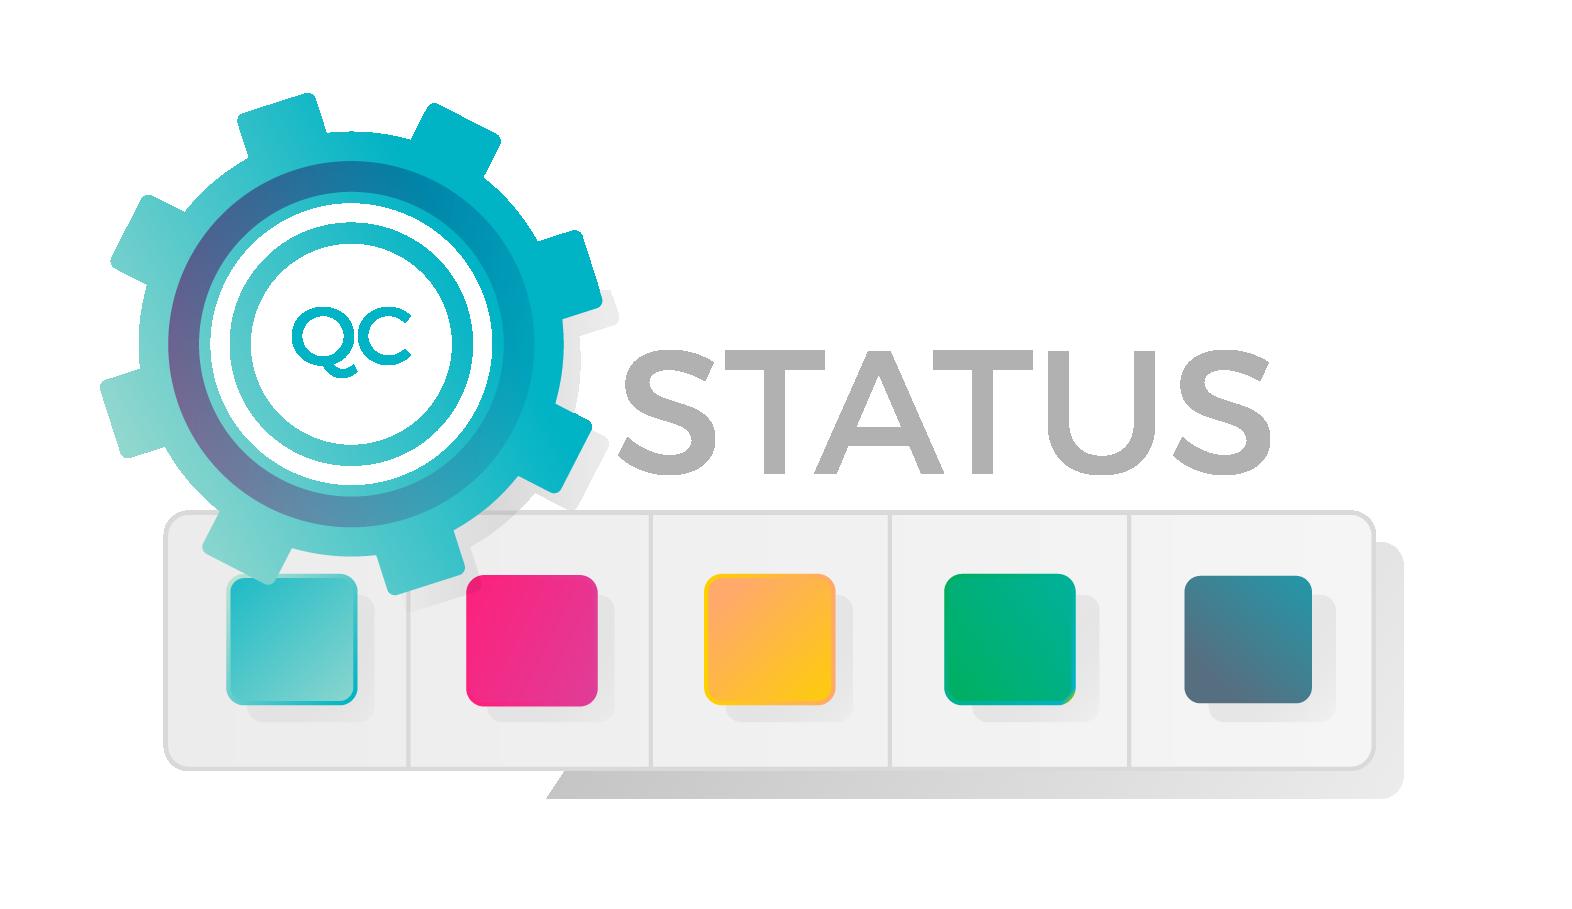 qc-status-for-confluence-cloud-app-qc-analytics